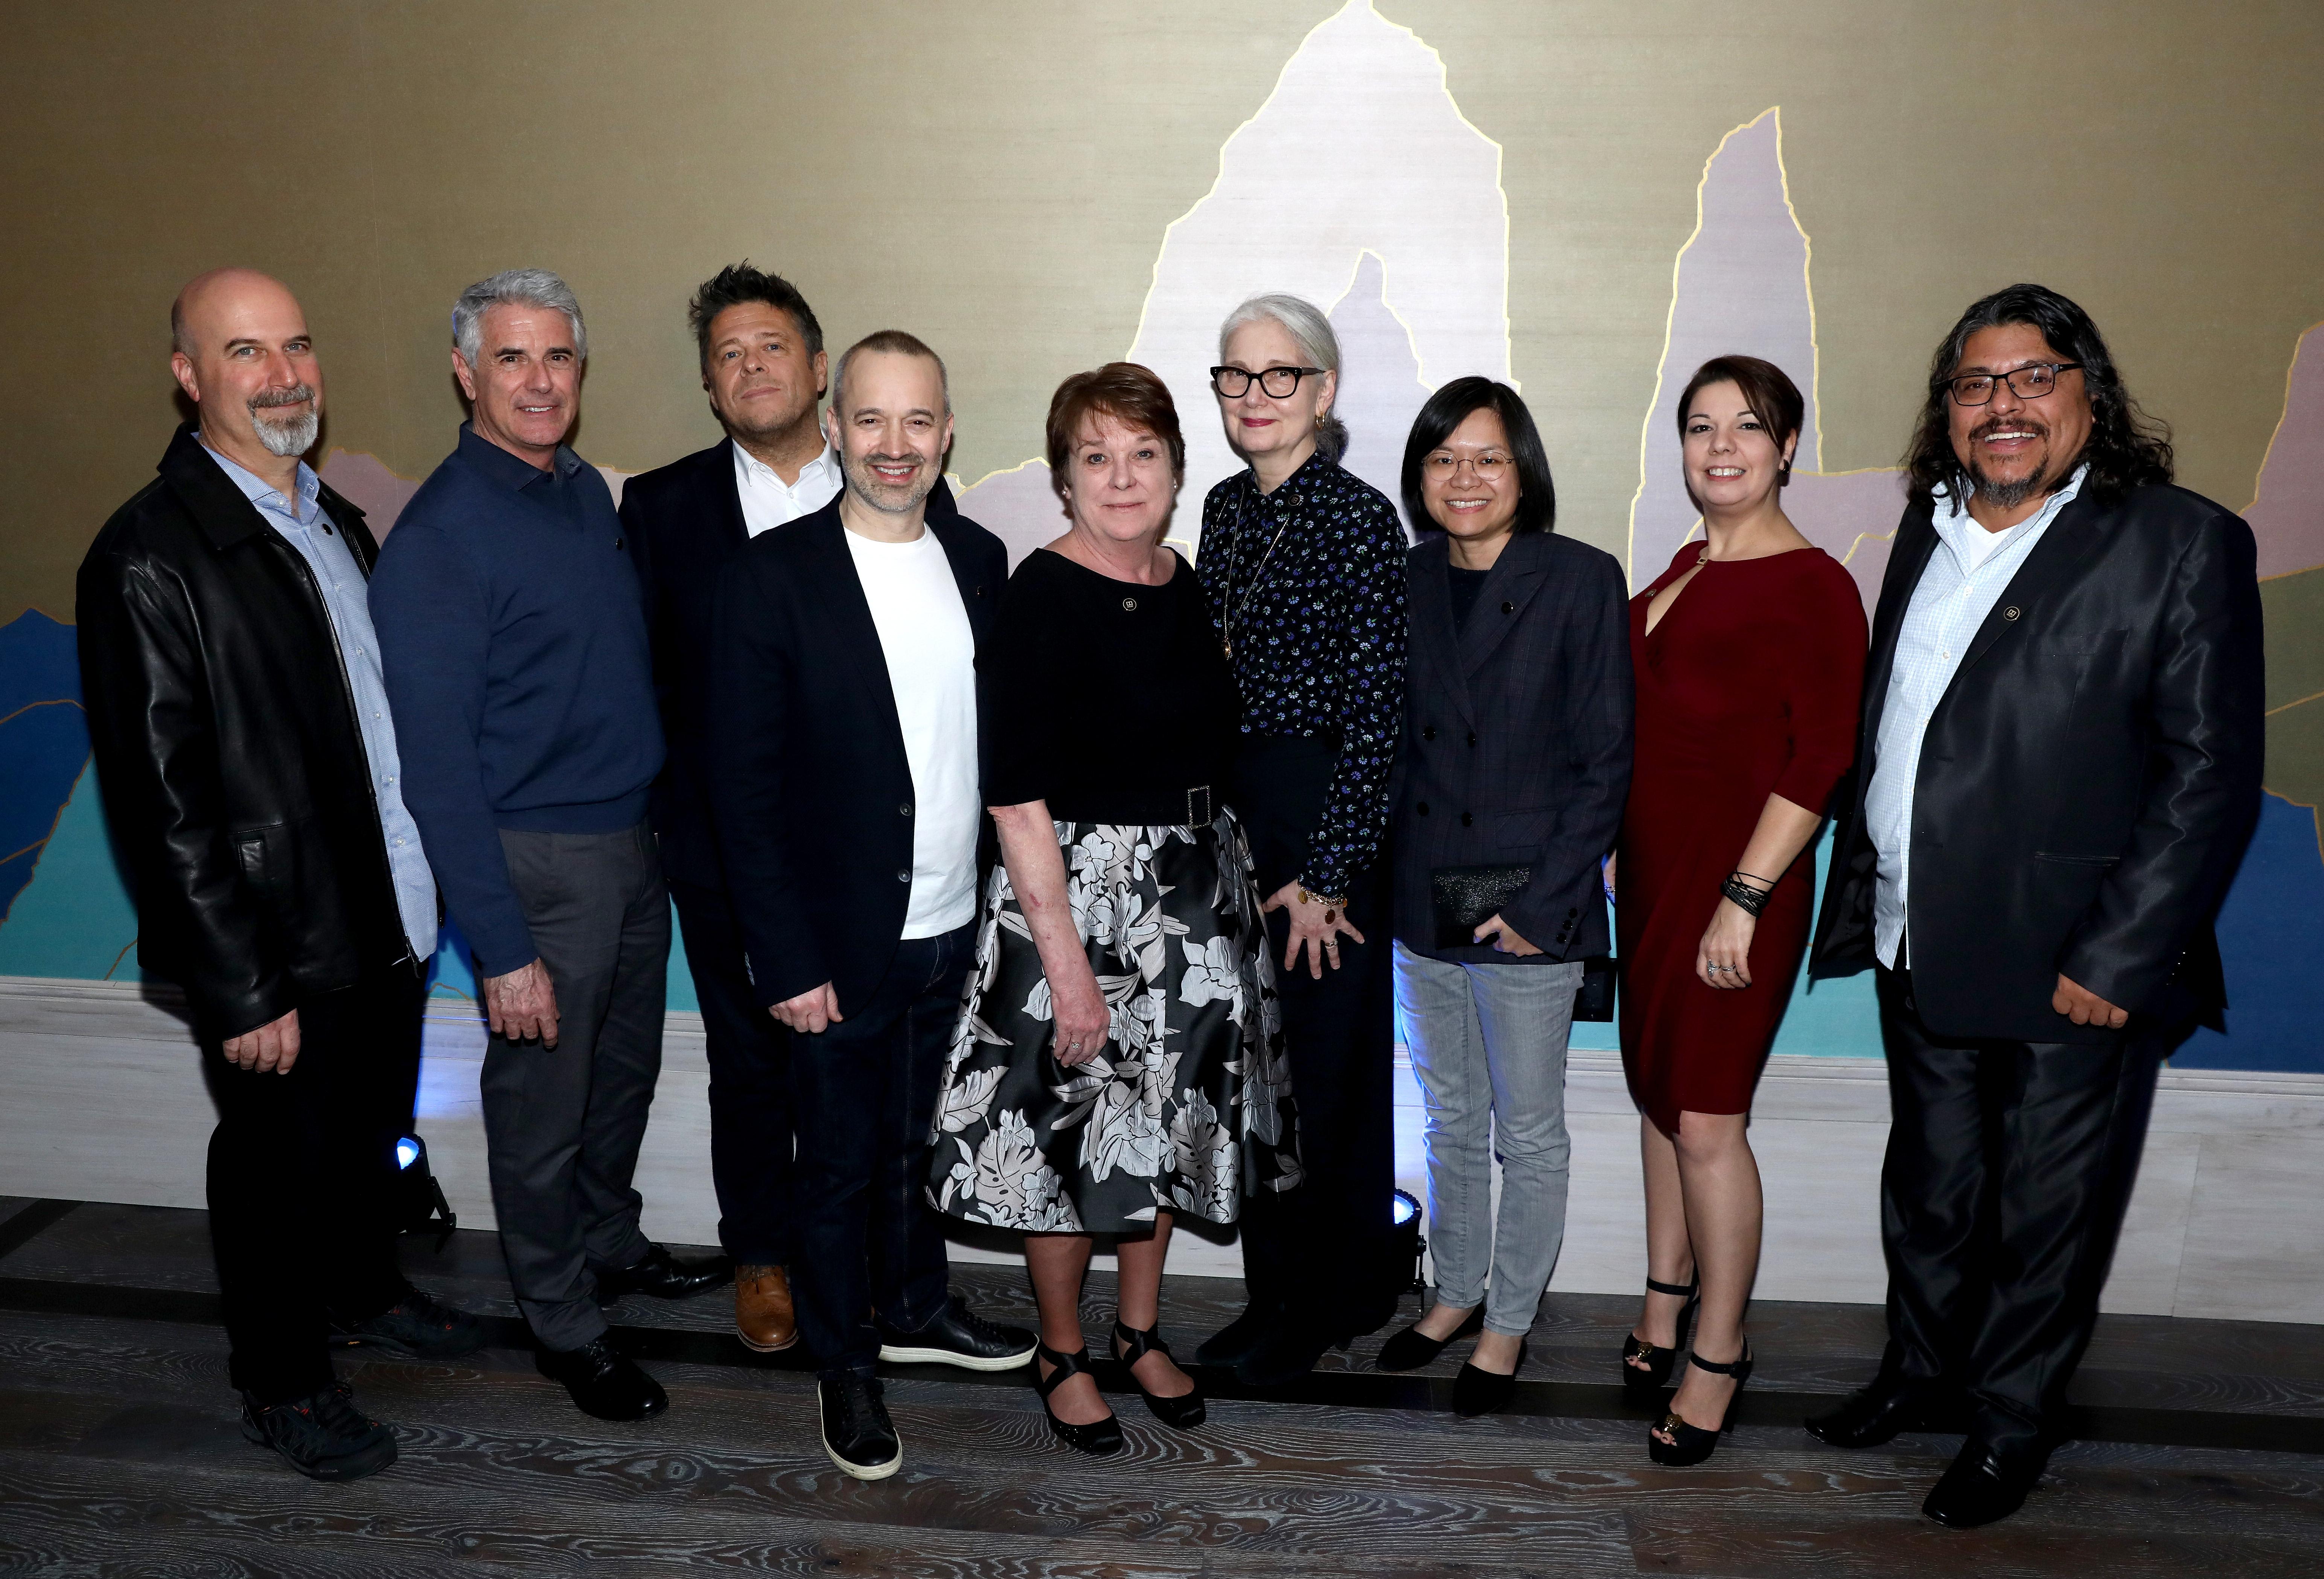 2019 Oscar Nominee Group Photo